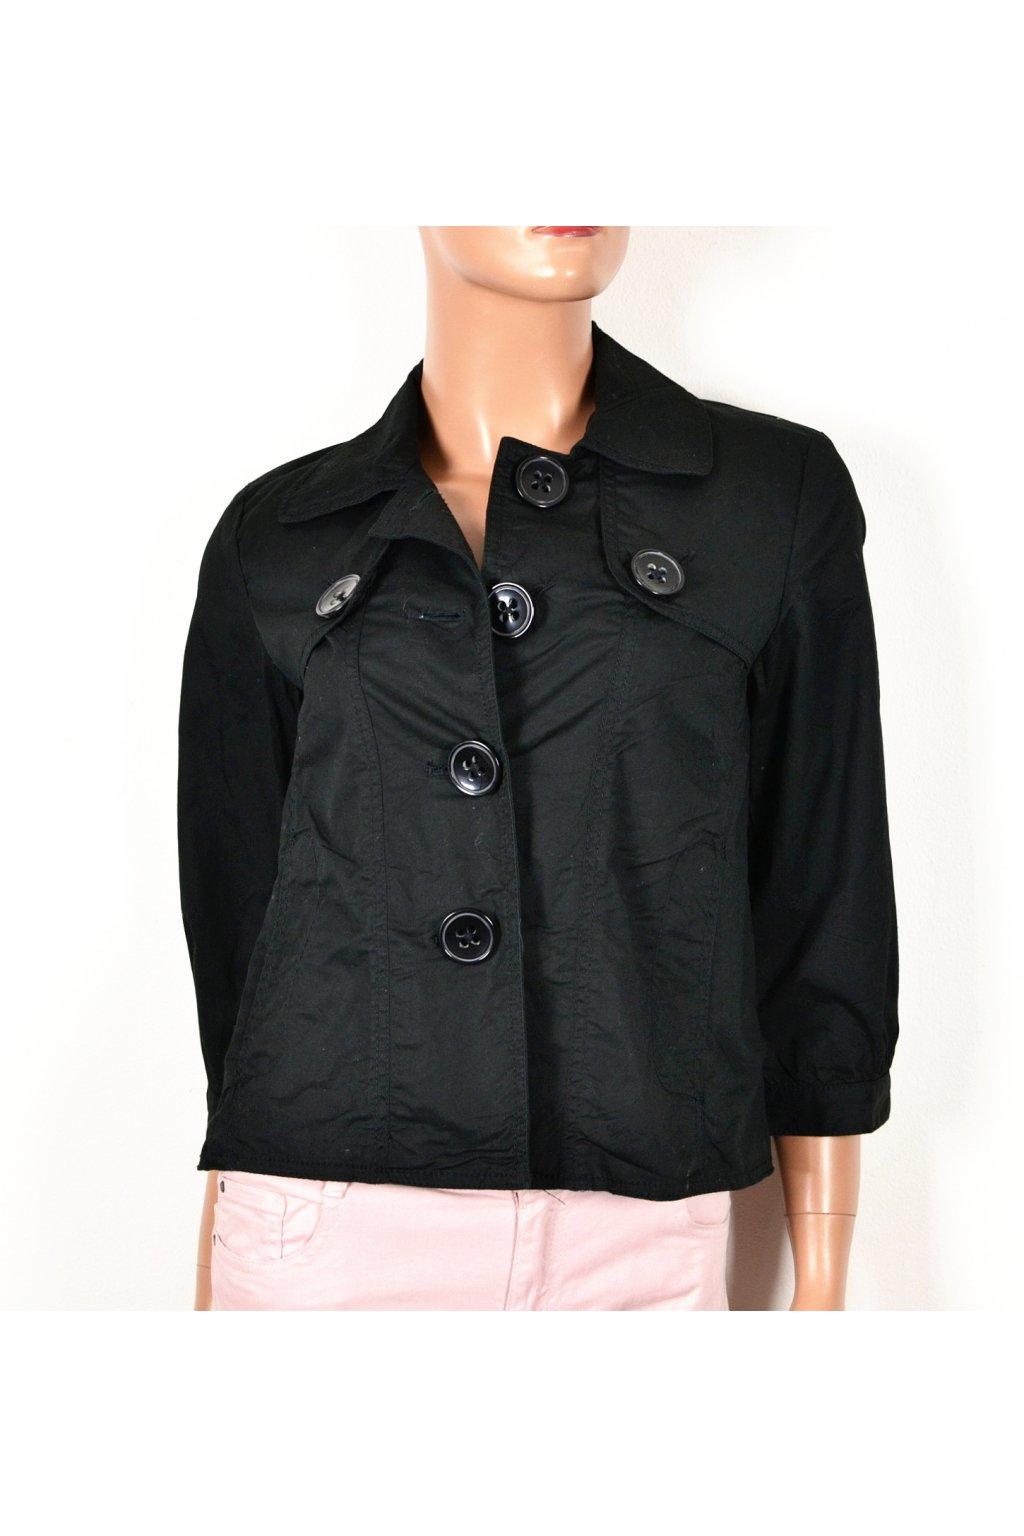 Kabát kabátek jarní Bossini Ladies vel S/M černý